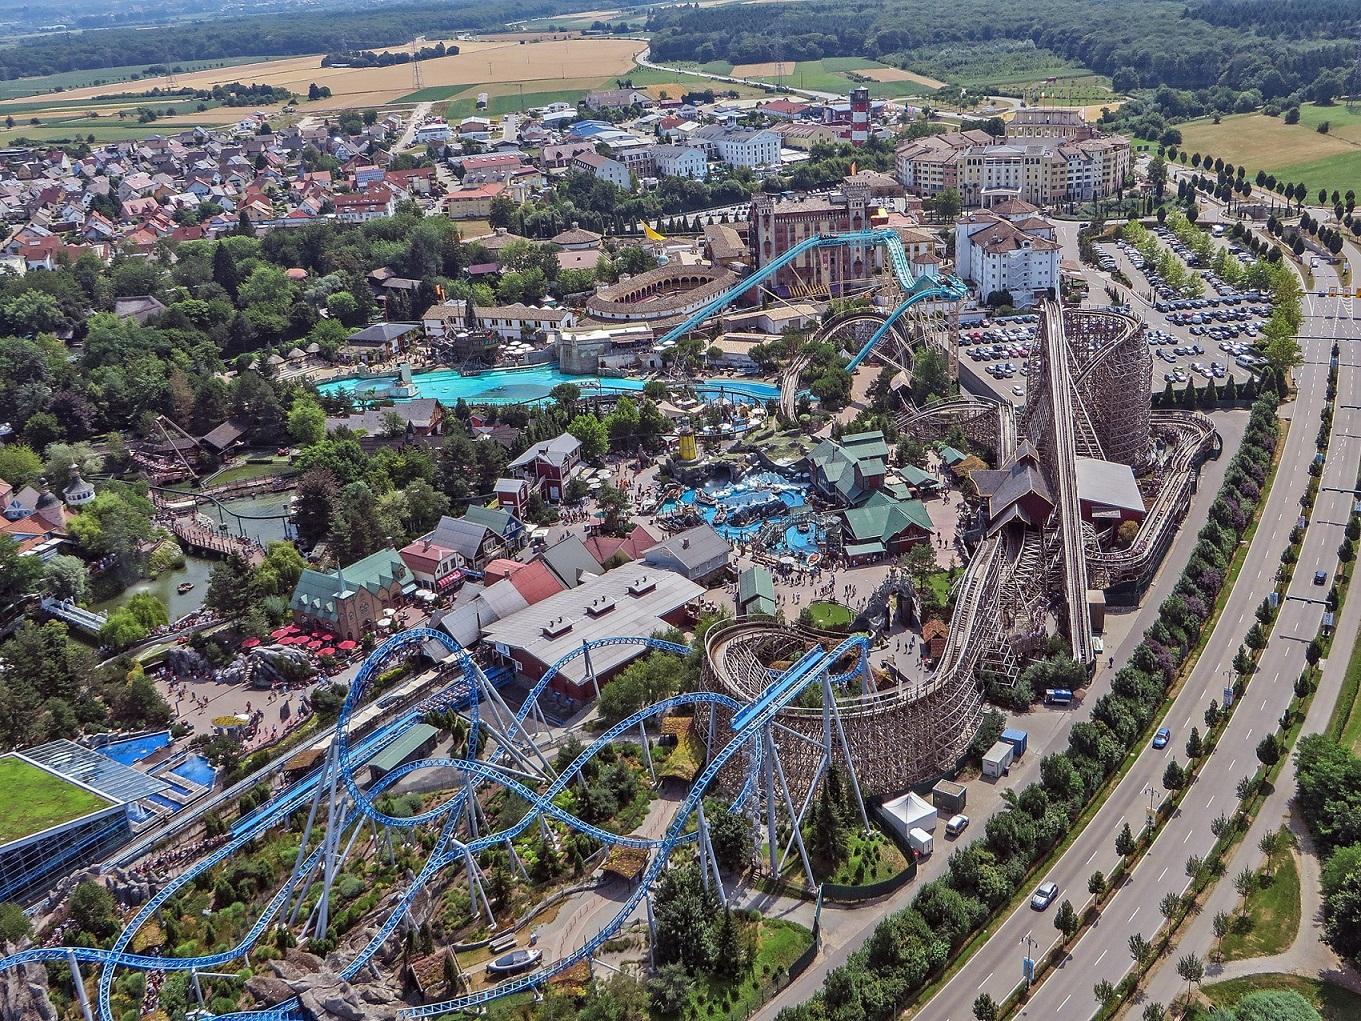 evropapark